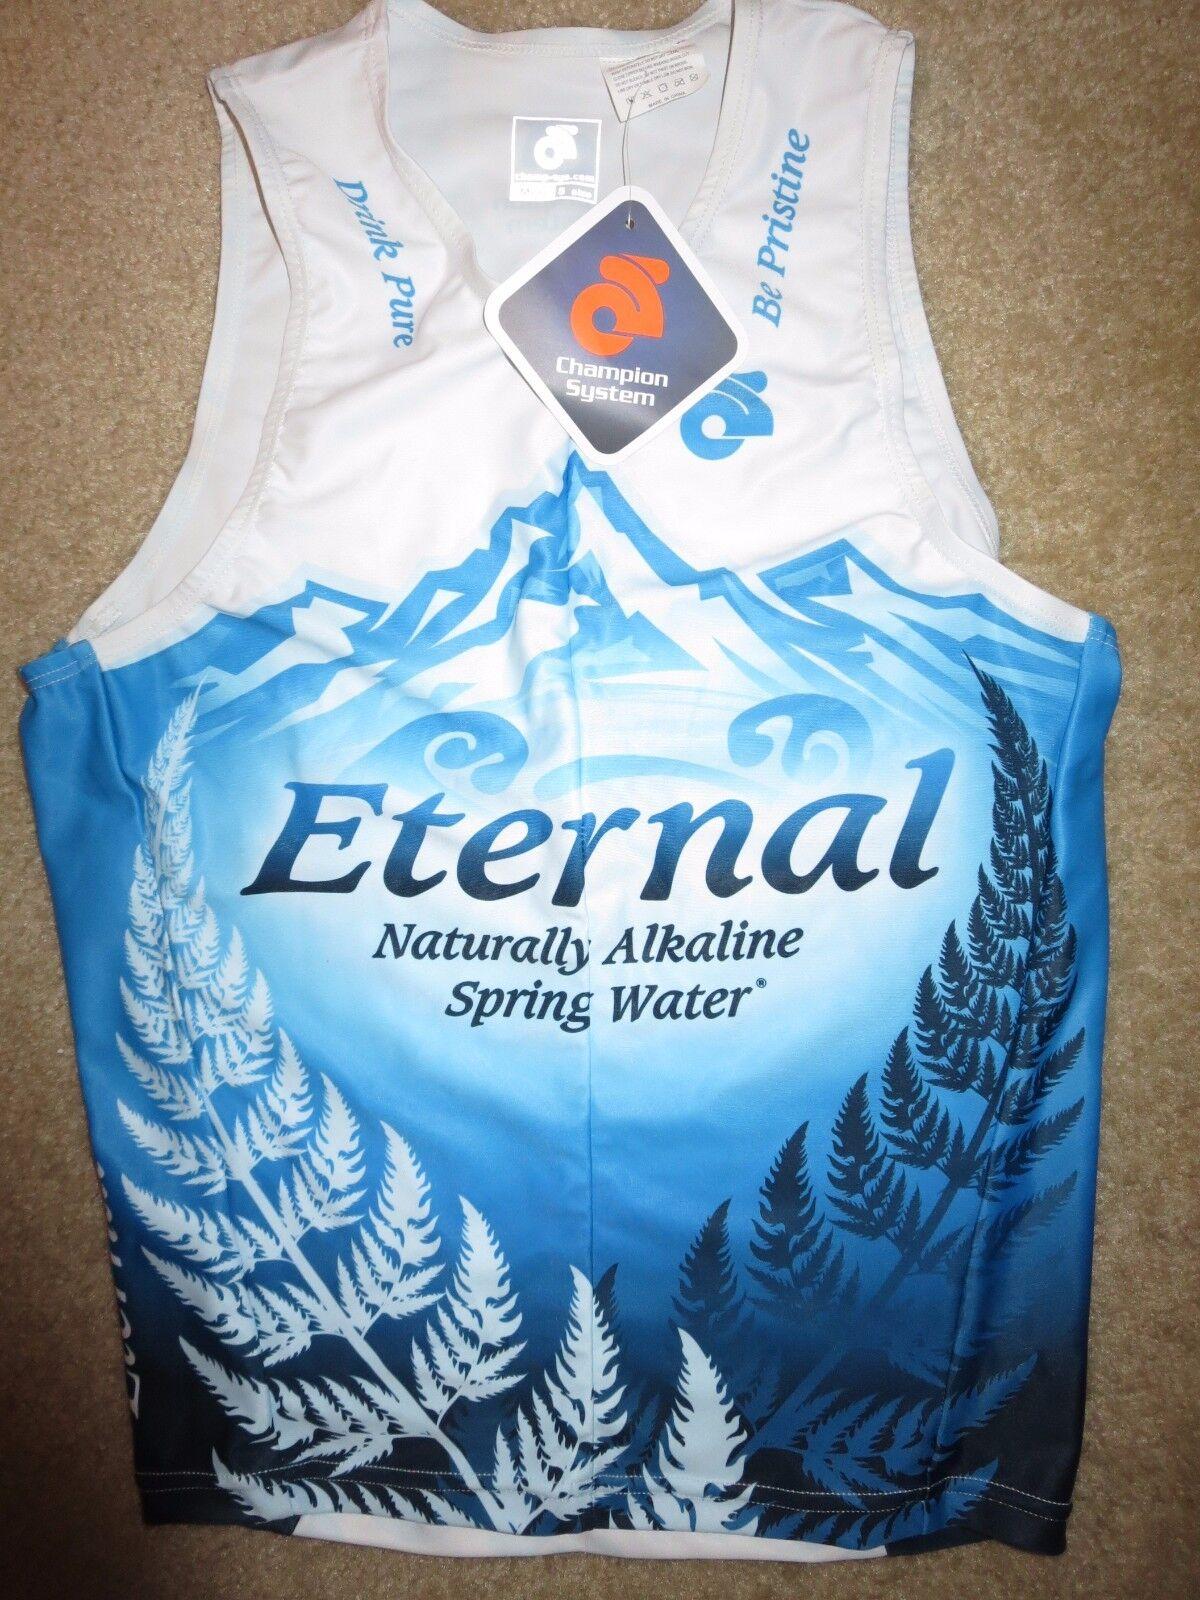 Eternal Spring Water Running Cycling Triathlon Champion System Jersey SM S NEW